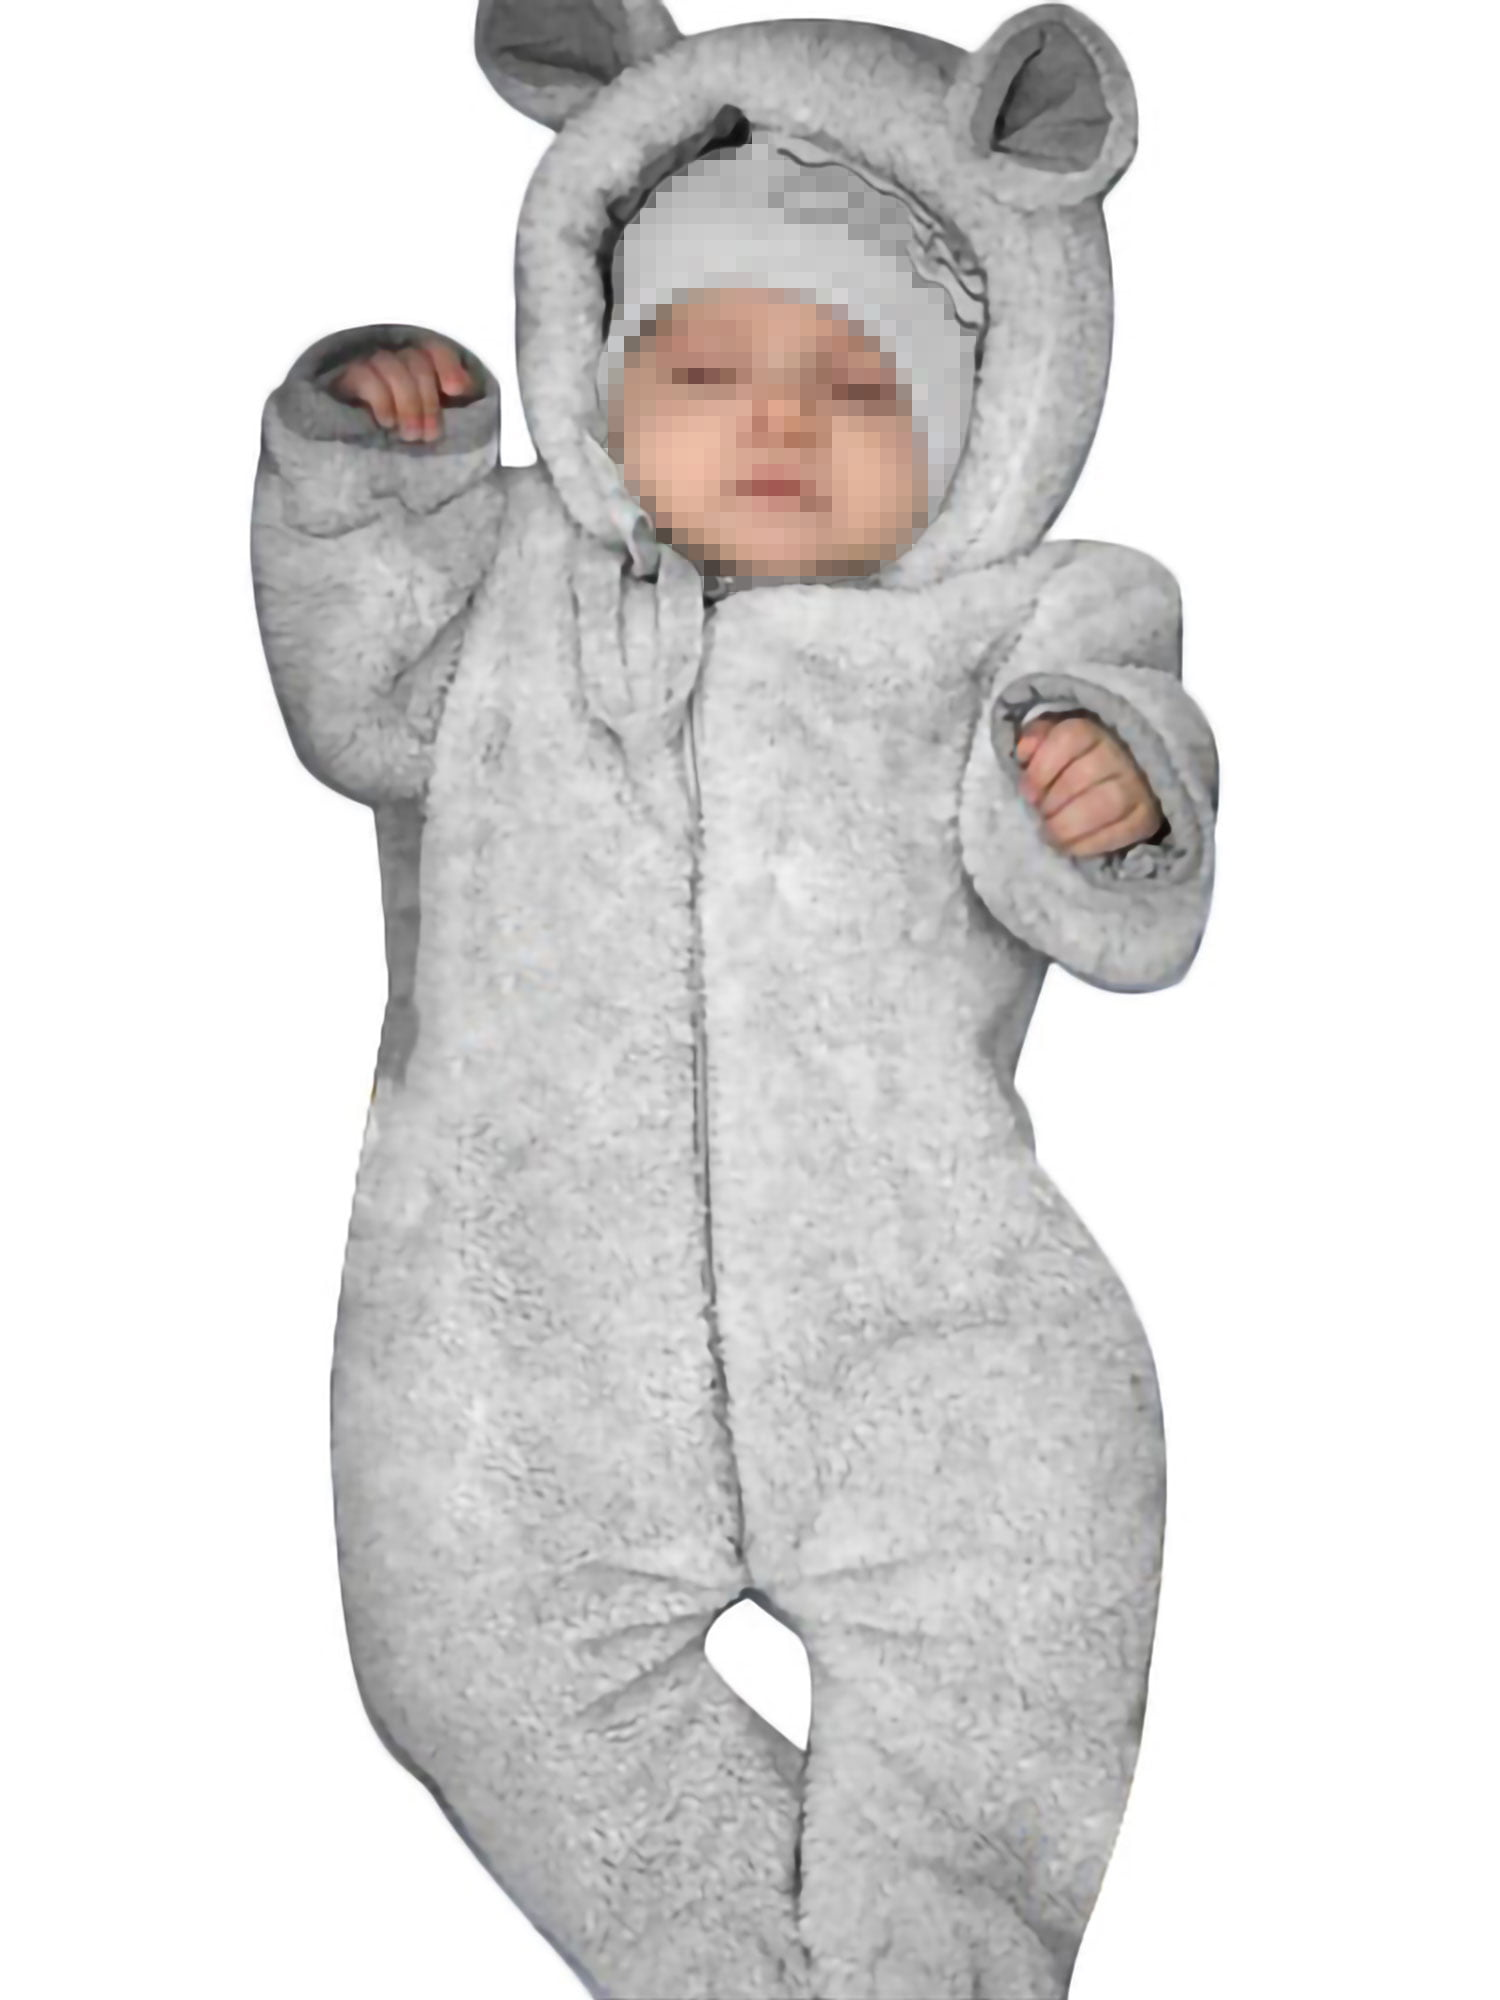 Newborn Fleece Romper Baby Boys Gilrs Jumpsuit Footies Winter Warm Sleepsuit Long Sleeve Onesie 0-3 Months